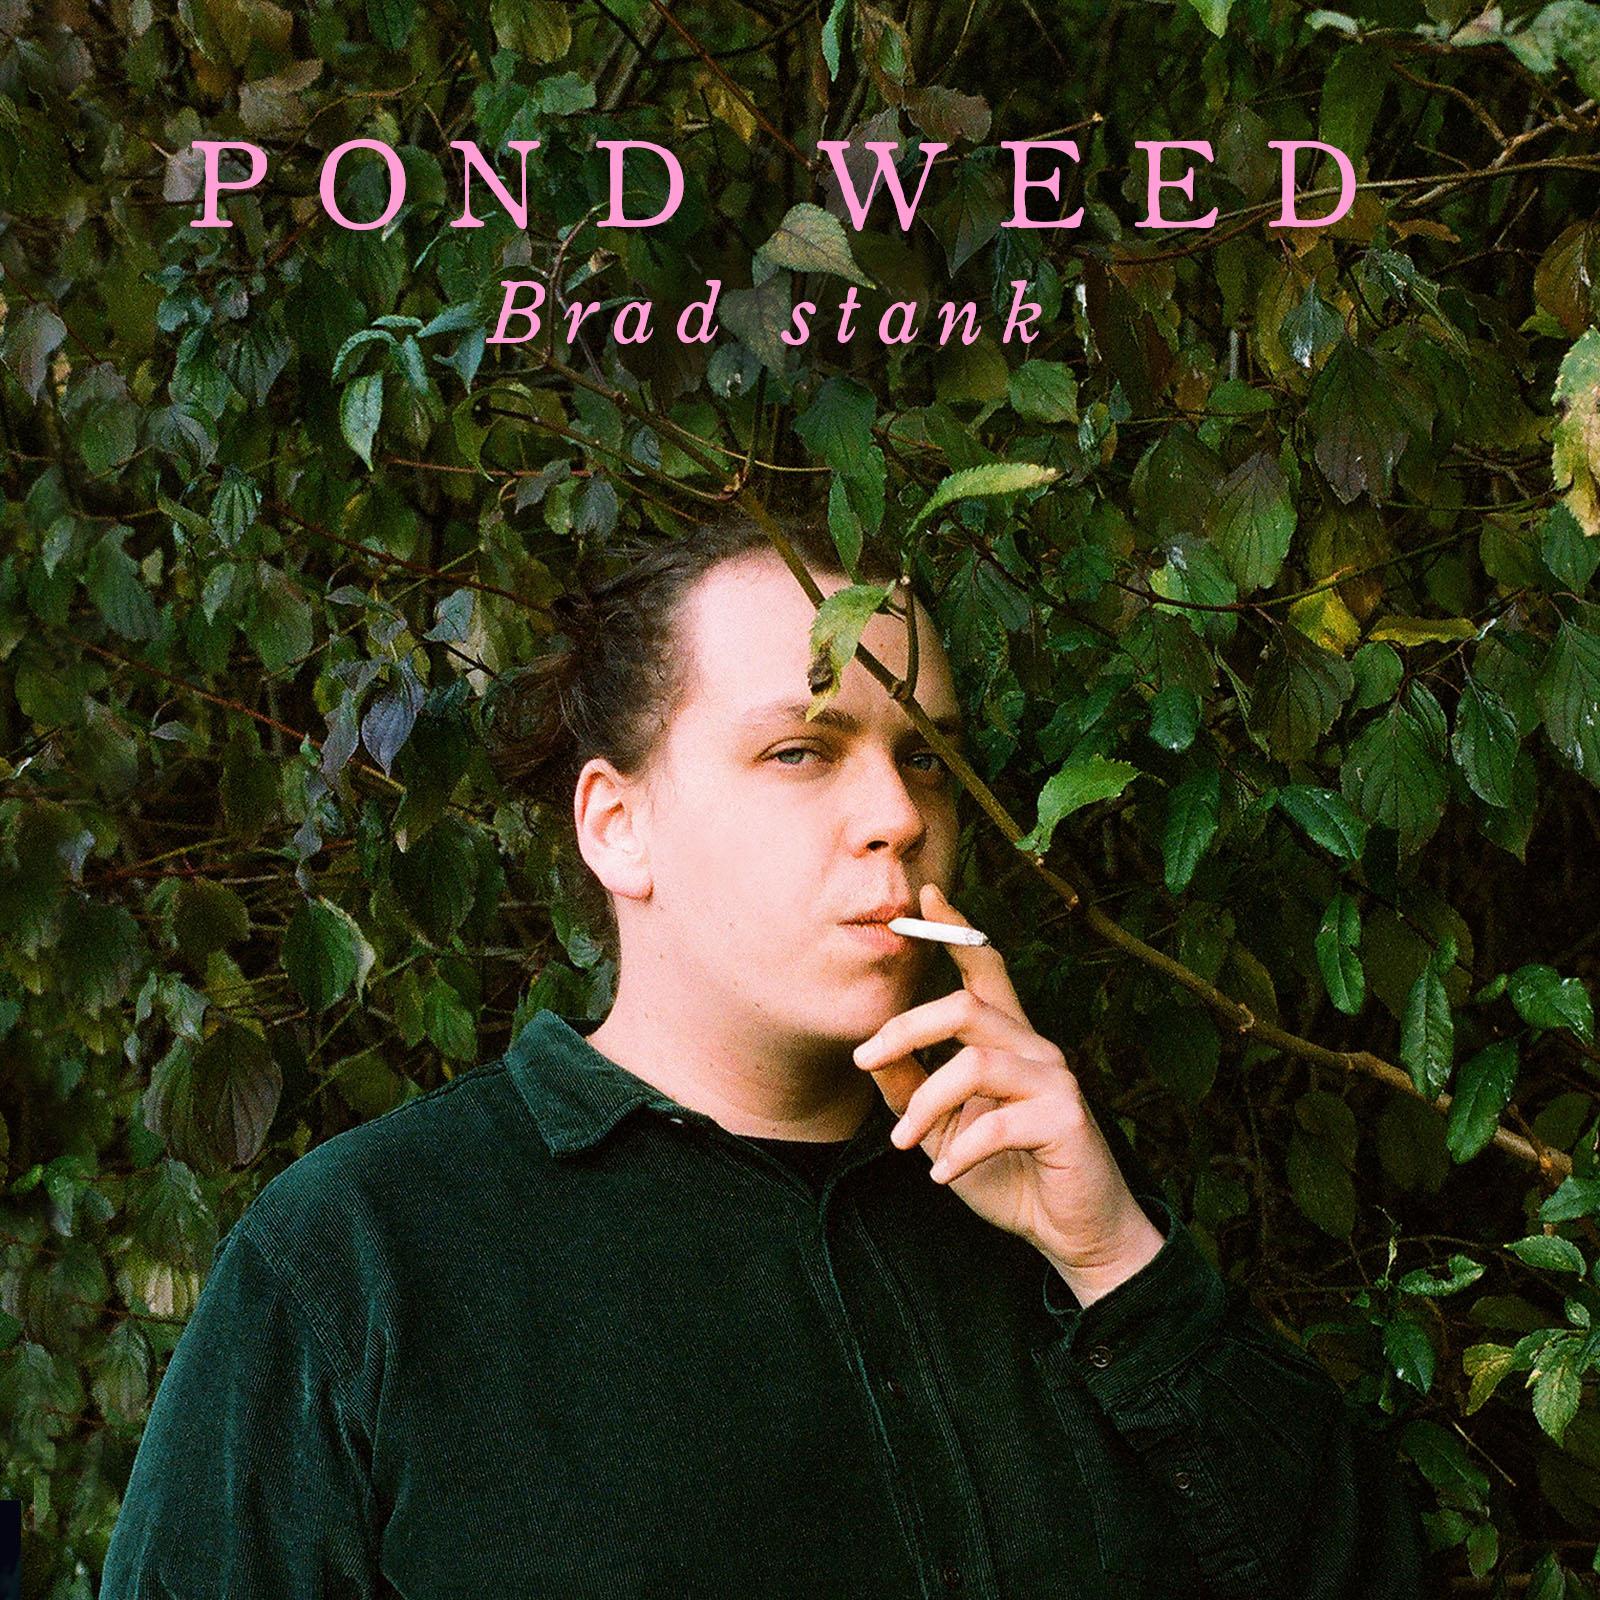 Bradstank_PondWeed.jpg